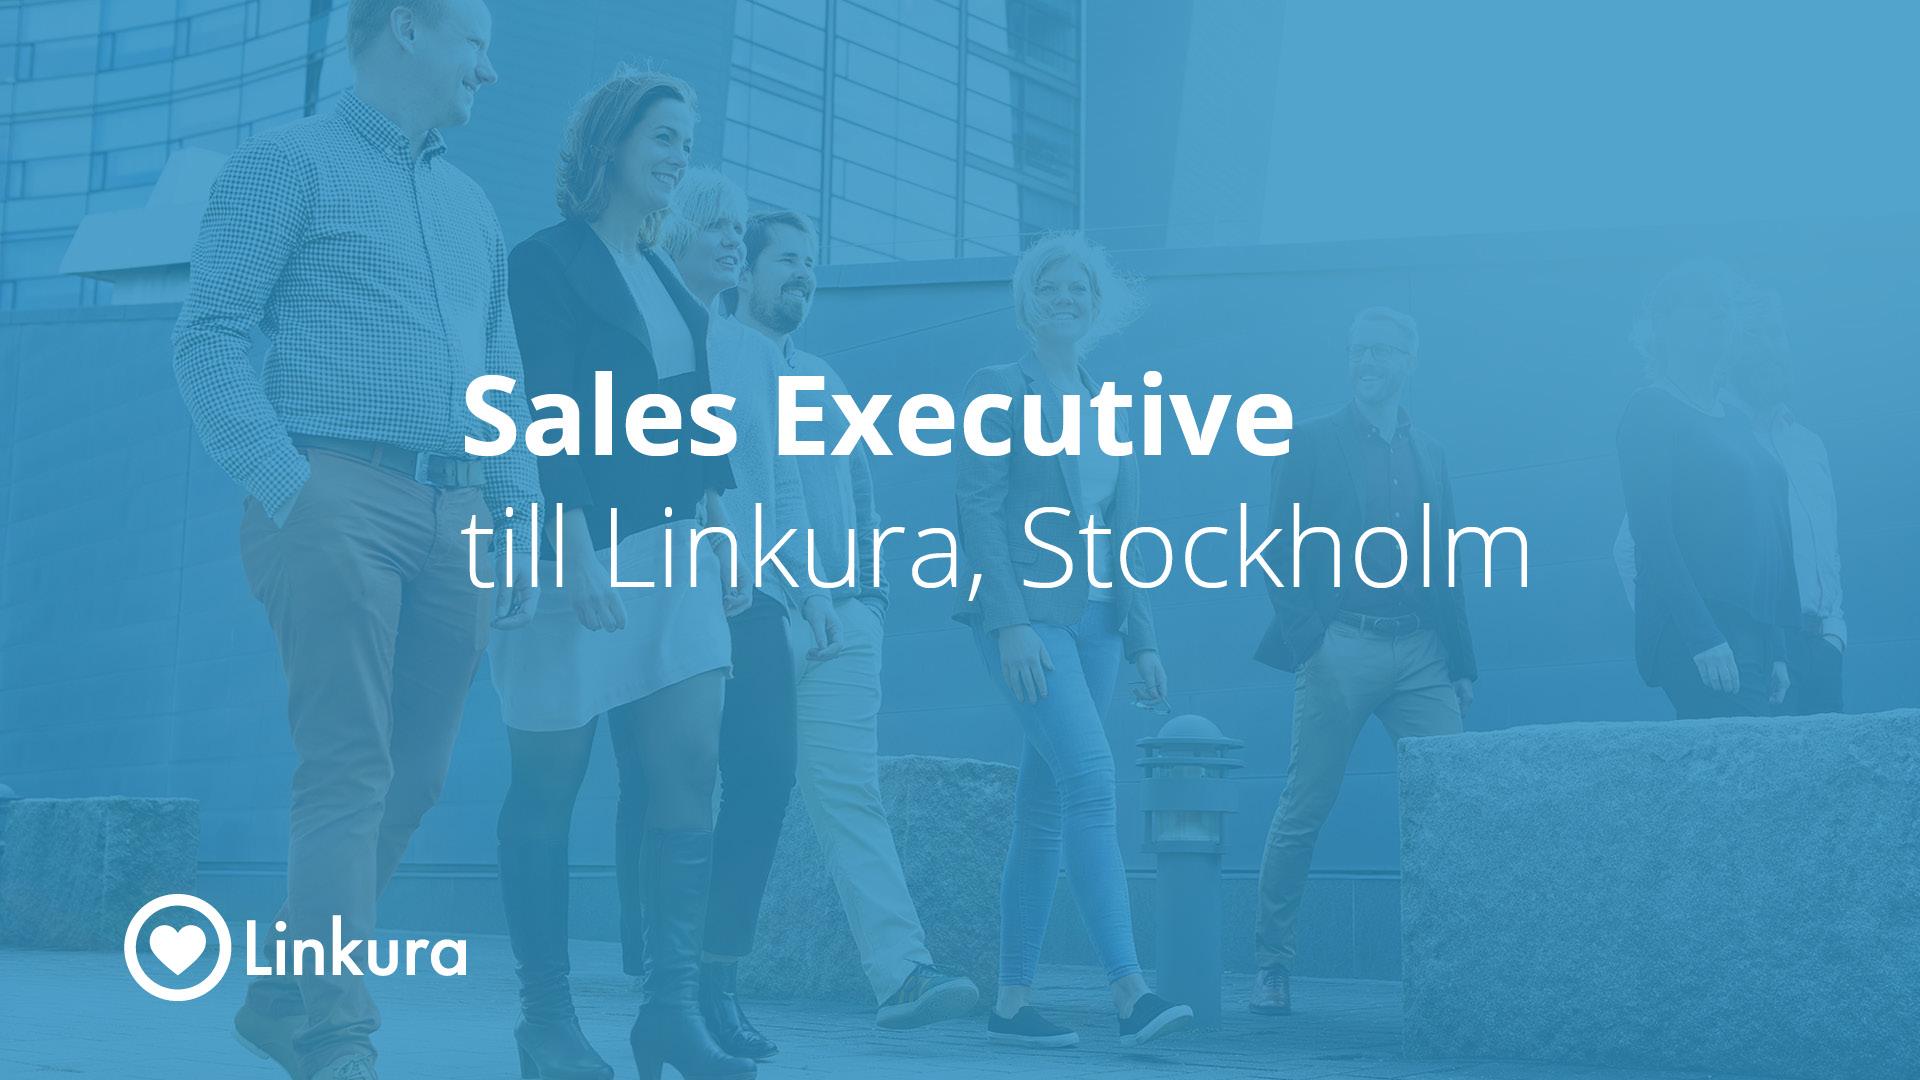 Sales Executive till Linkura, Stockholm